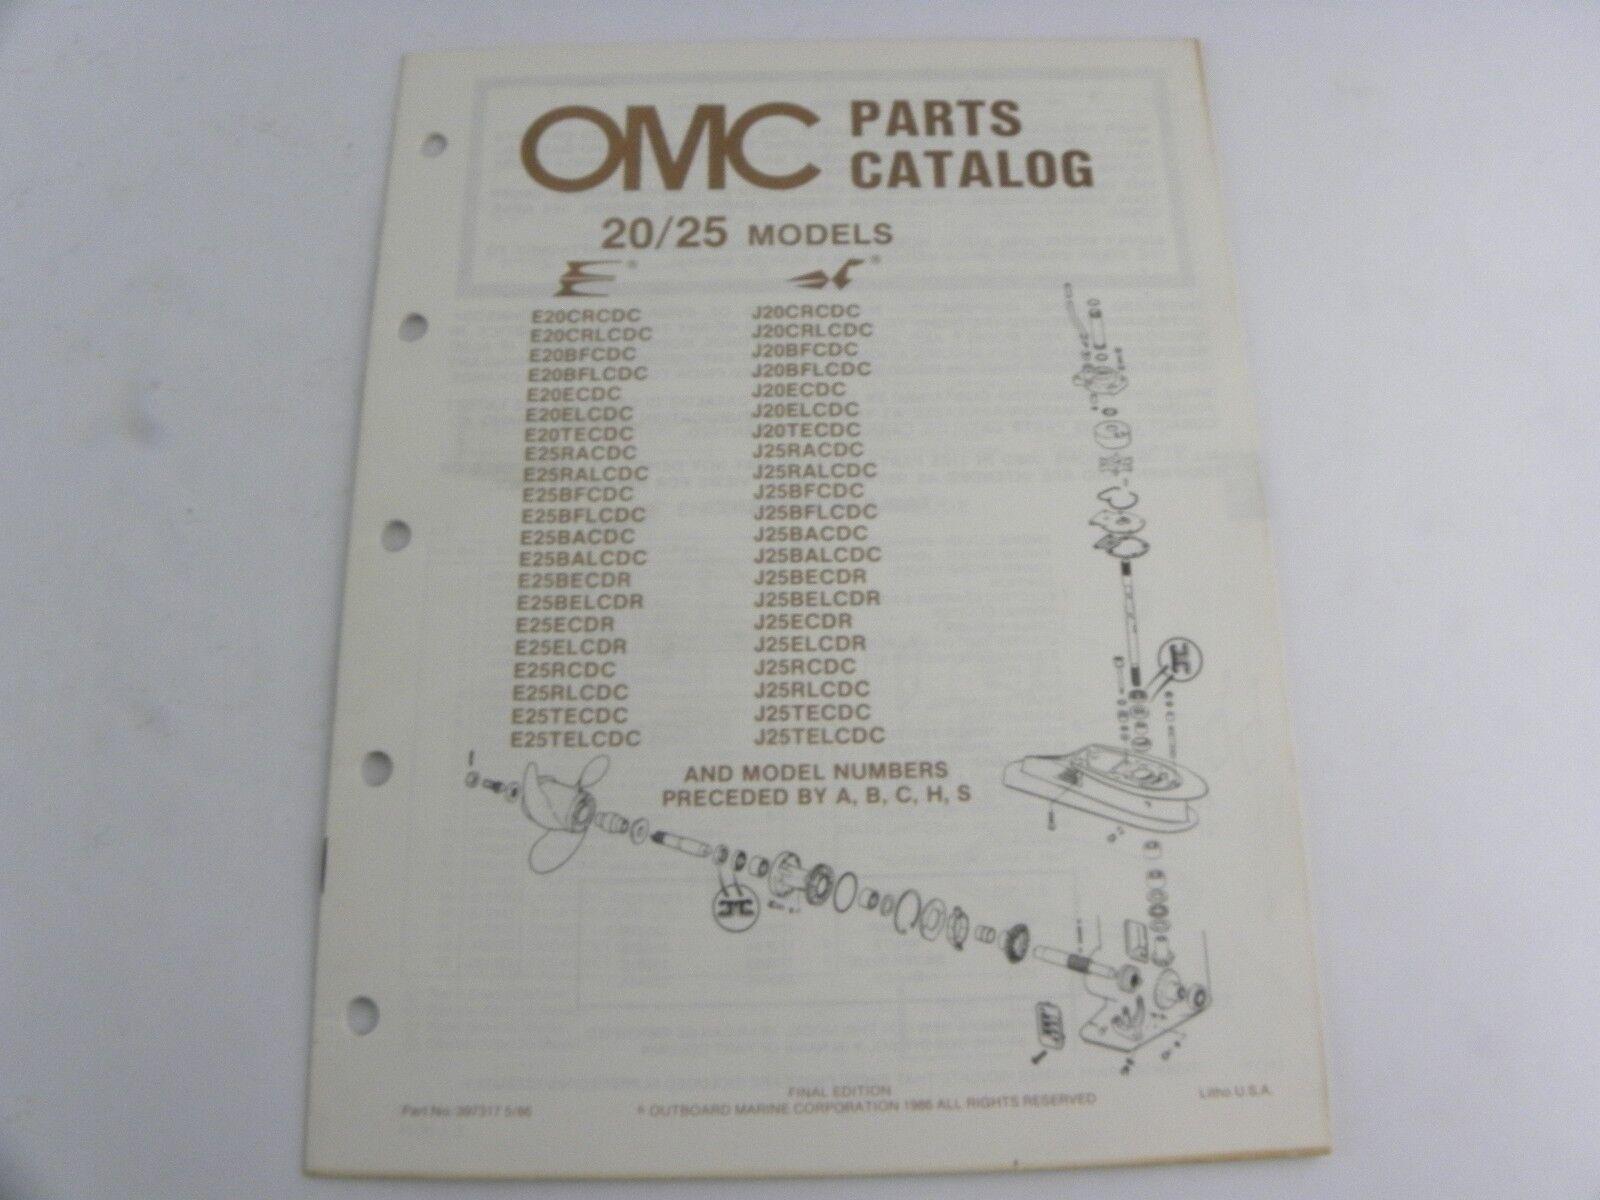 Evinrude Johnson 20 / 25 Models Outboard Motor Parts Catalog Manual 1986 OMC